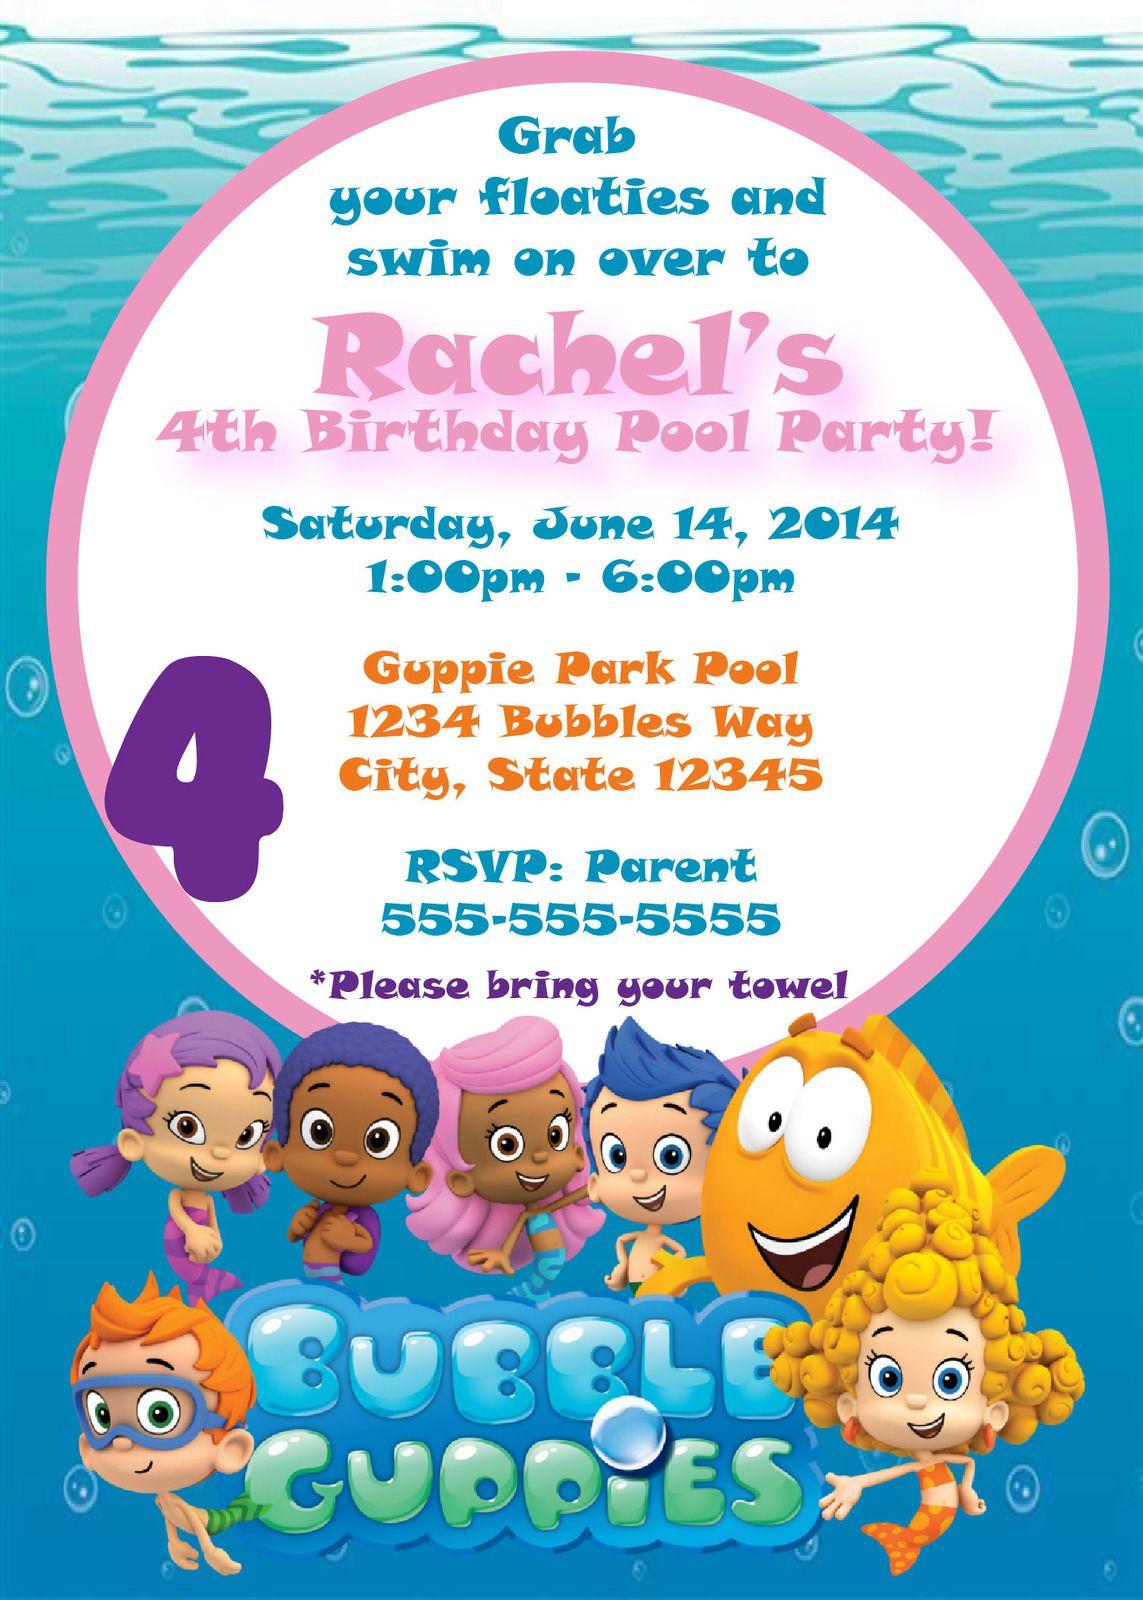 $10 - Bubble Guppies Pool Party Birthday Invite   Pool ...